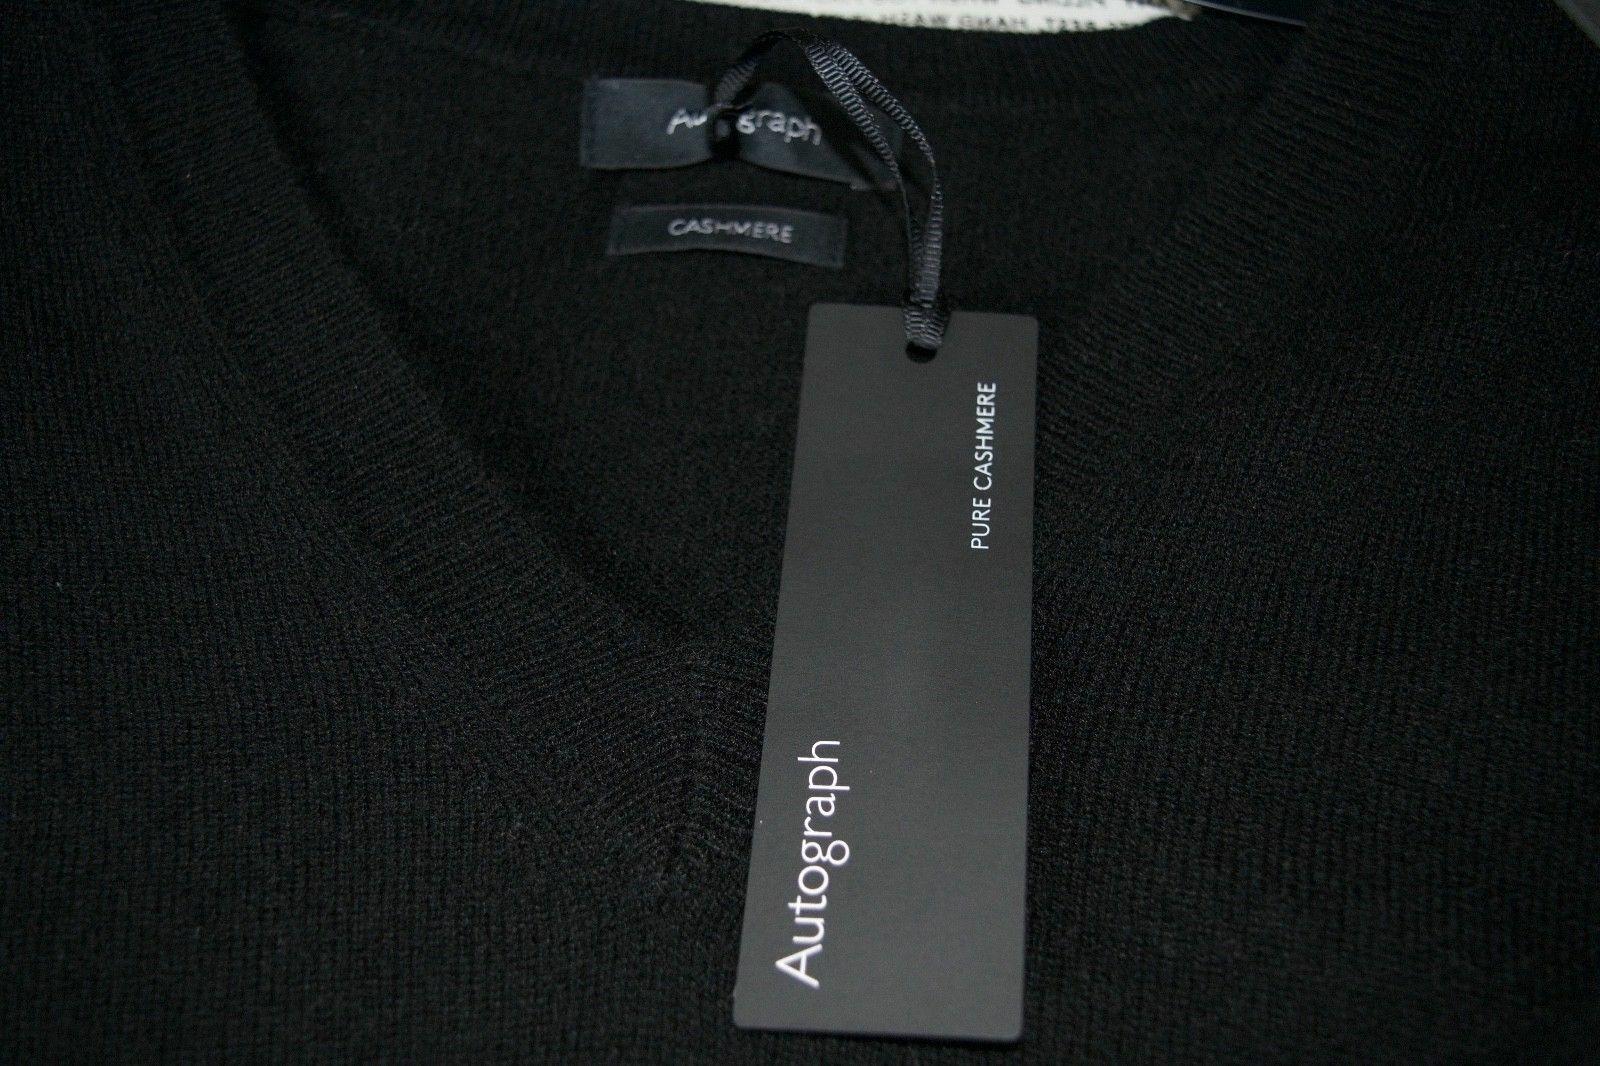 Neuf Marks & Spencer Autograph pur cachemire schwarz col V Pull Größes 12